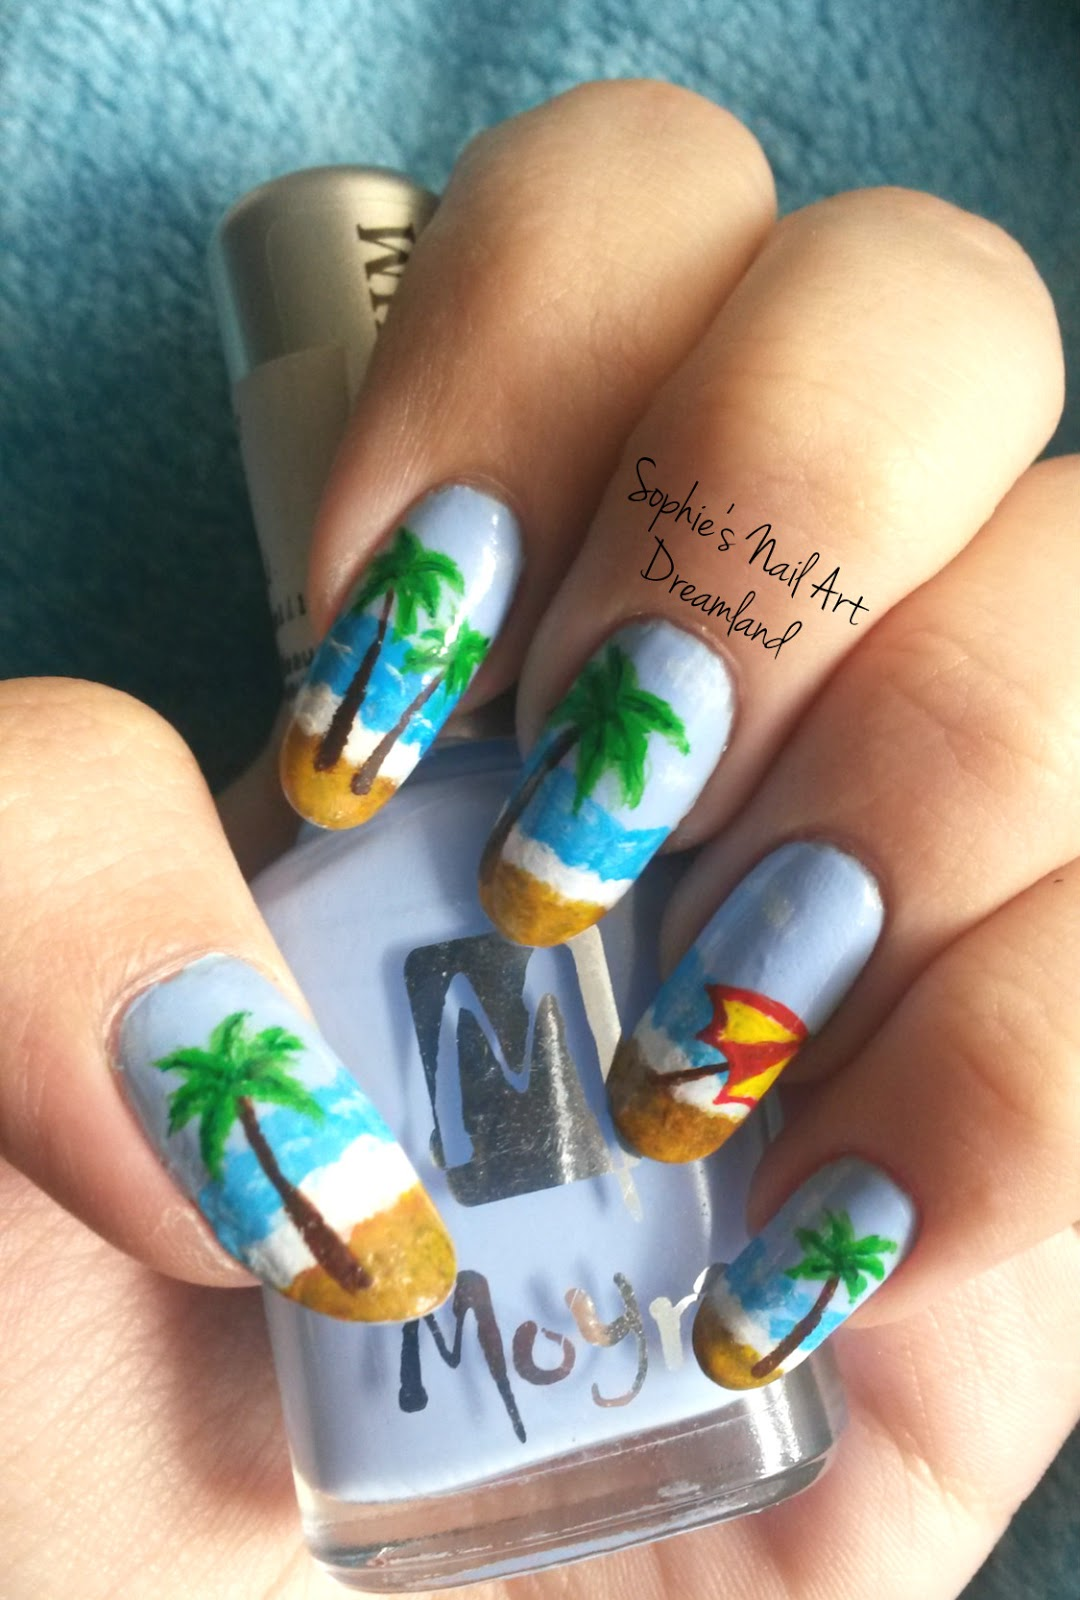 Nail Art Marathon 2015 - 4. Palm trees | Sophie\'s Nail Art Dreamland